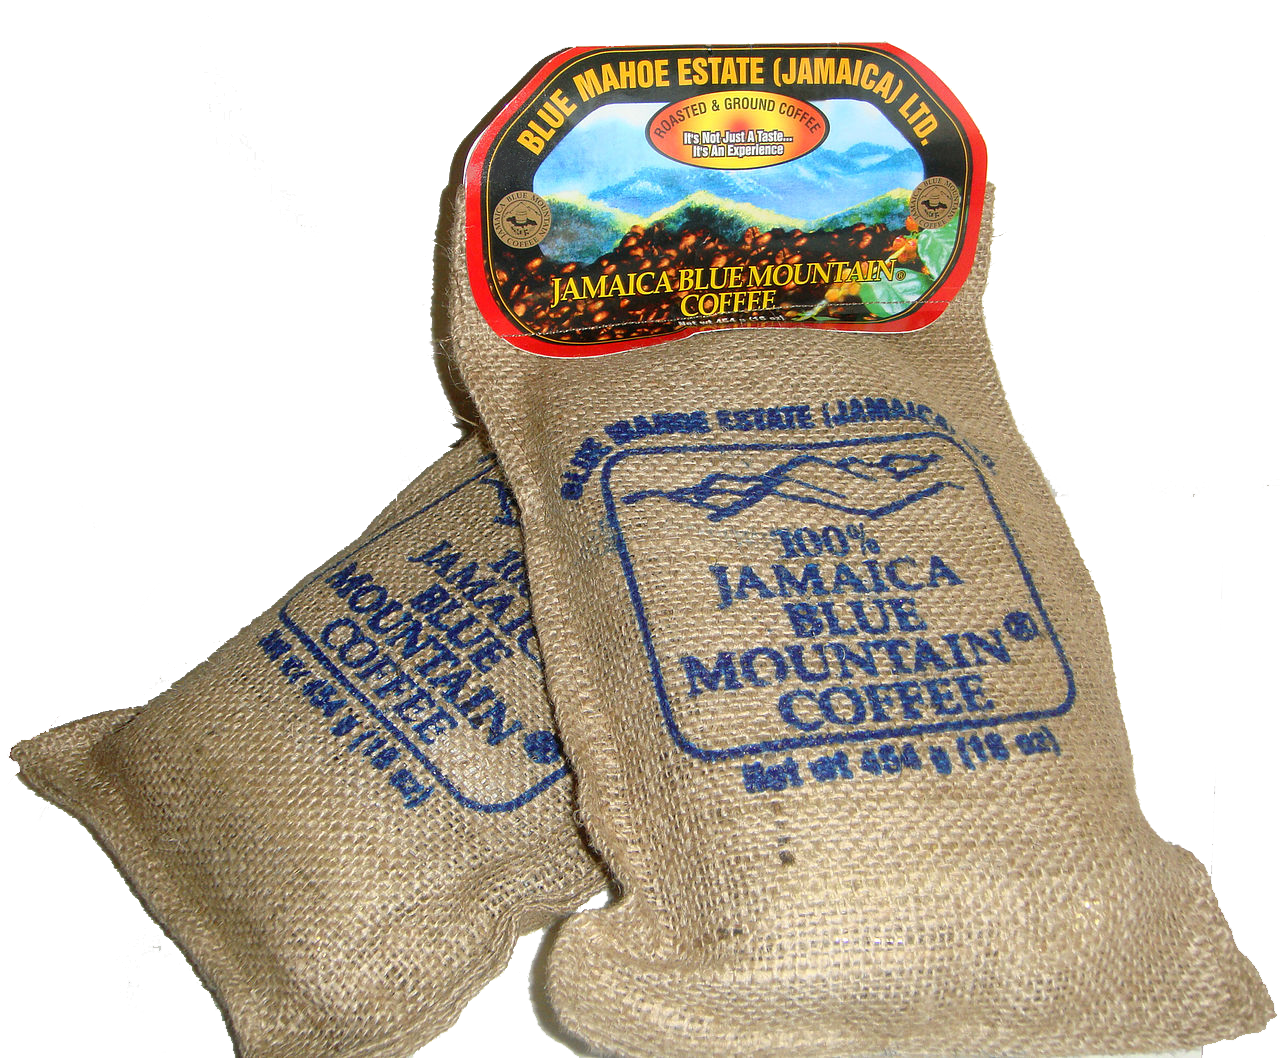 Jamaica_Blue_Mountain_Coffee_Latino Café